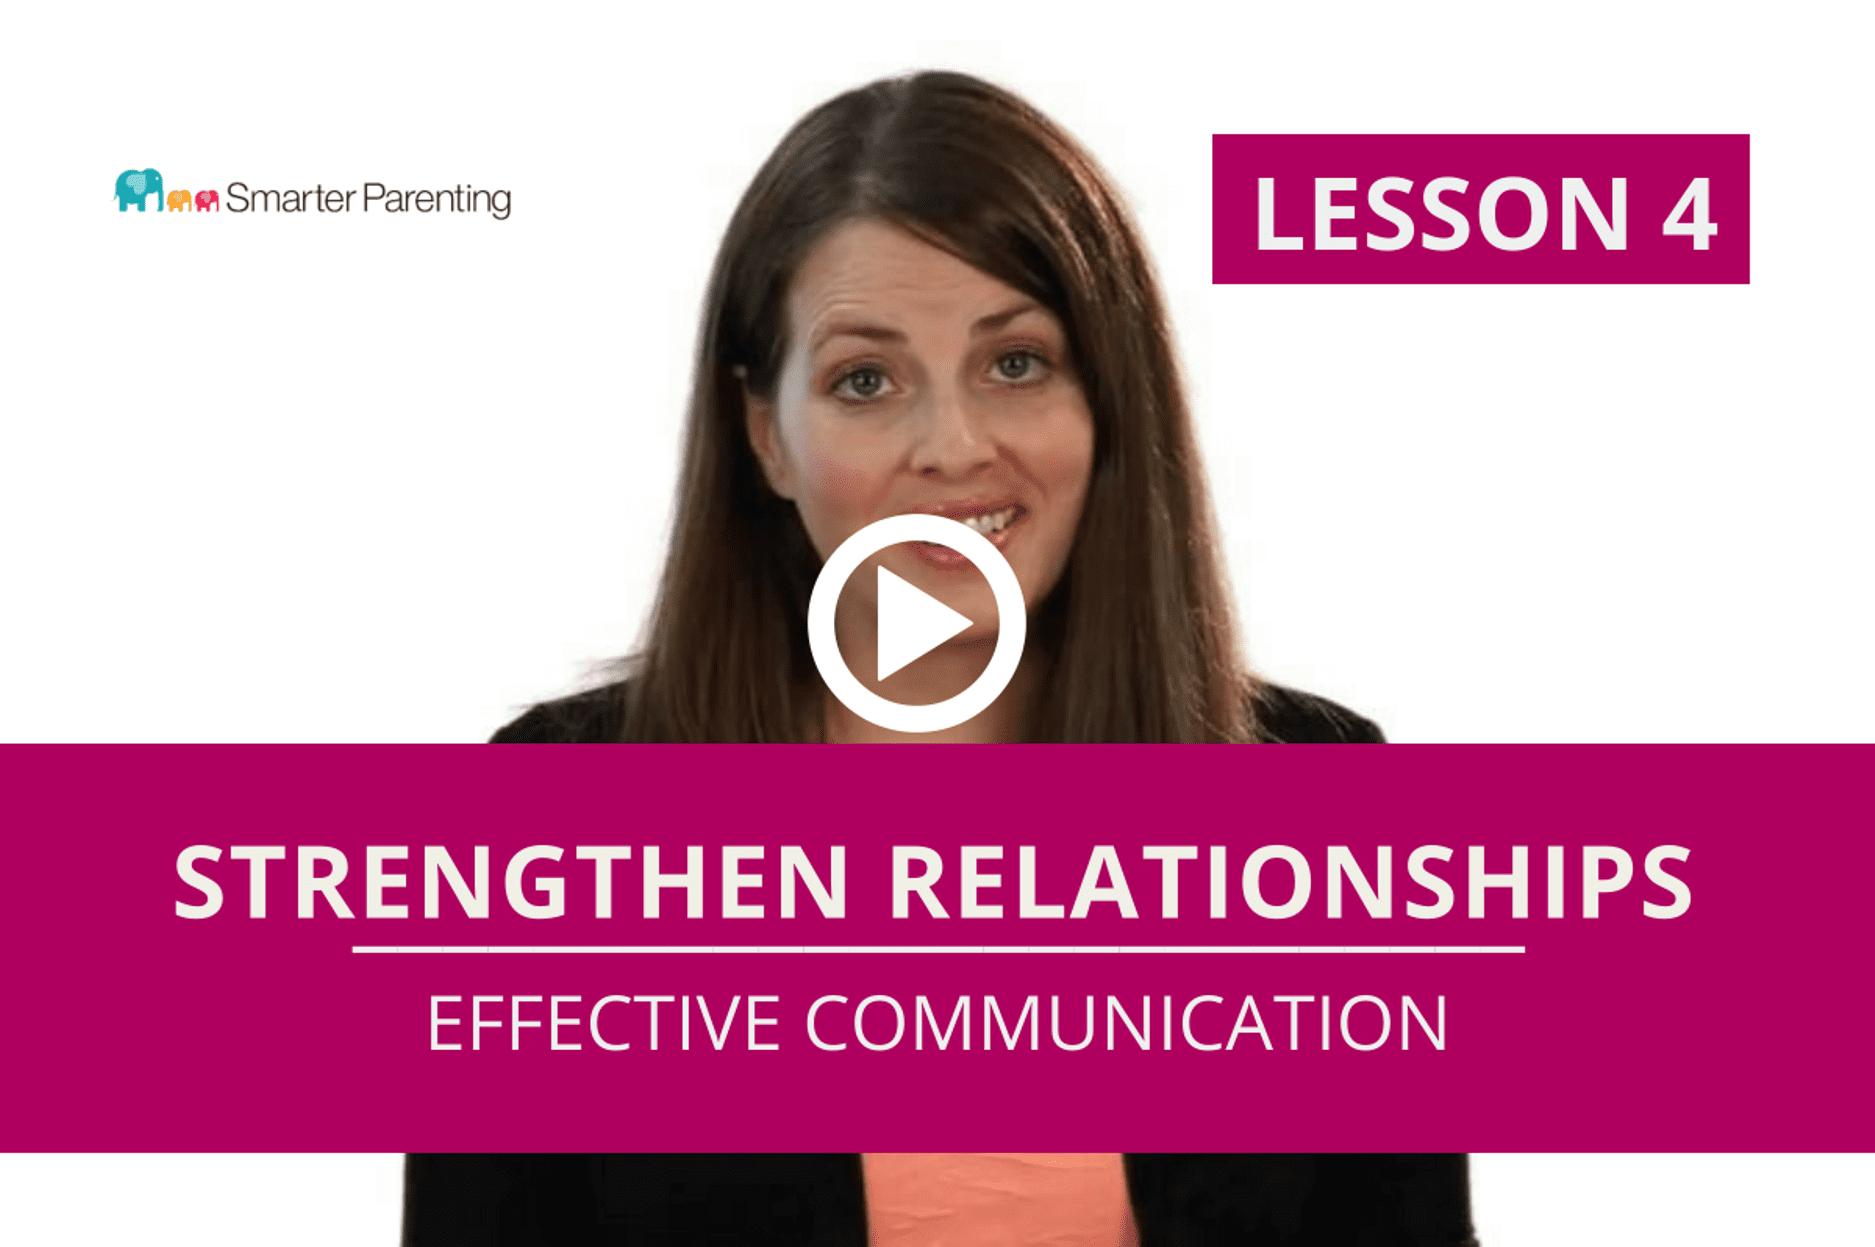 Effective Communication lesson link